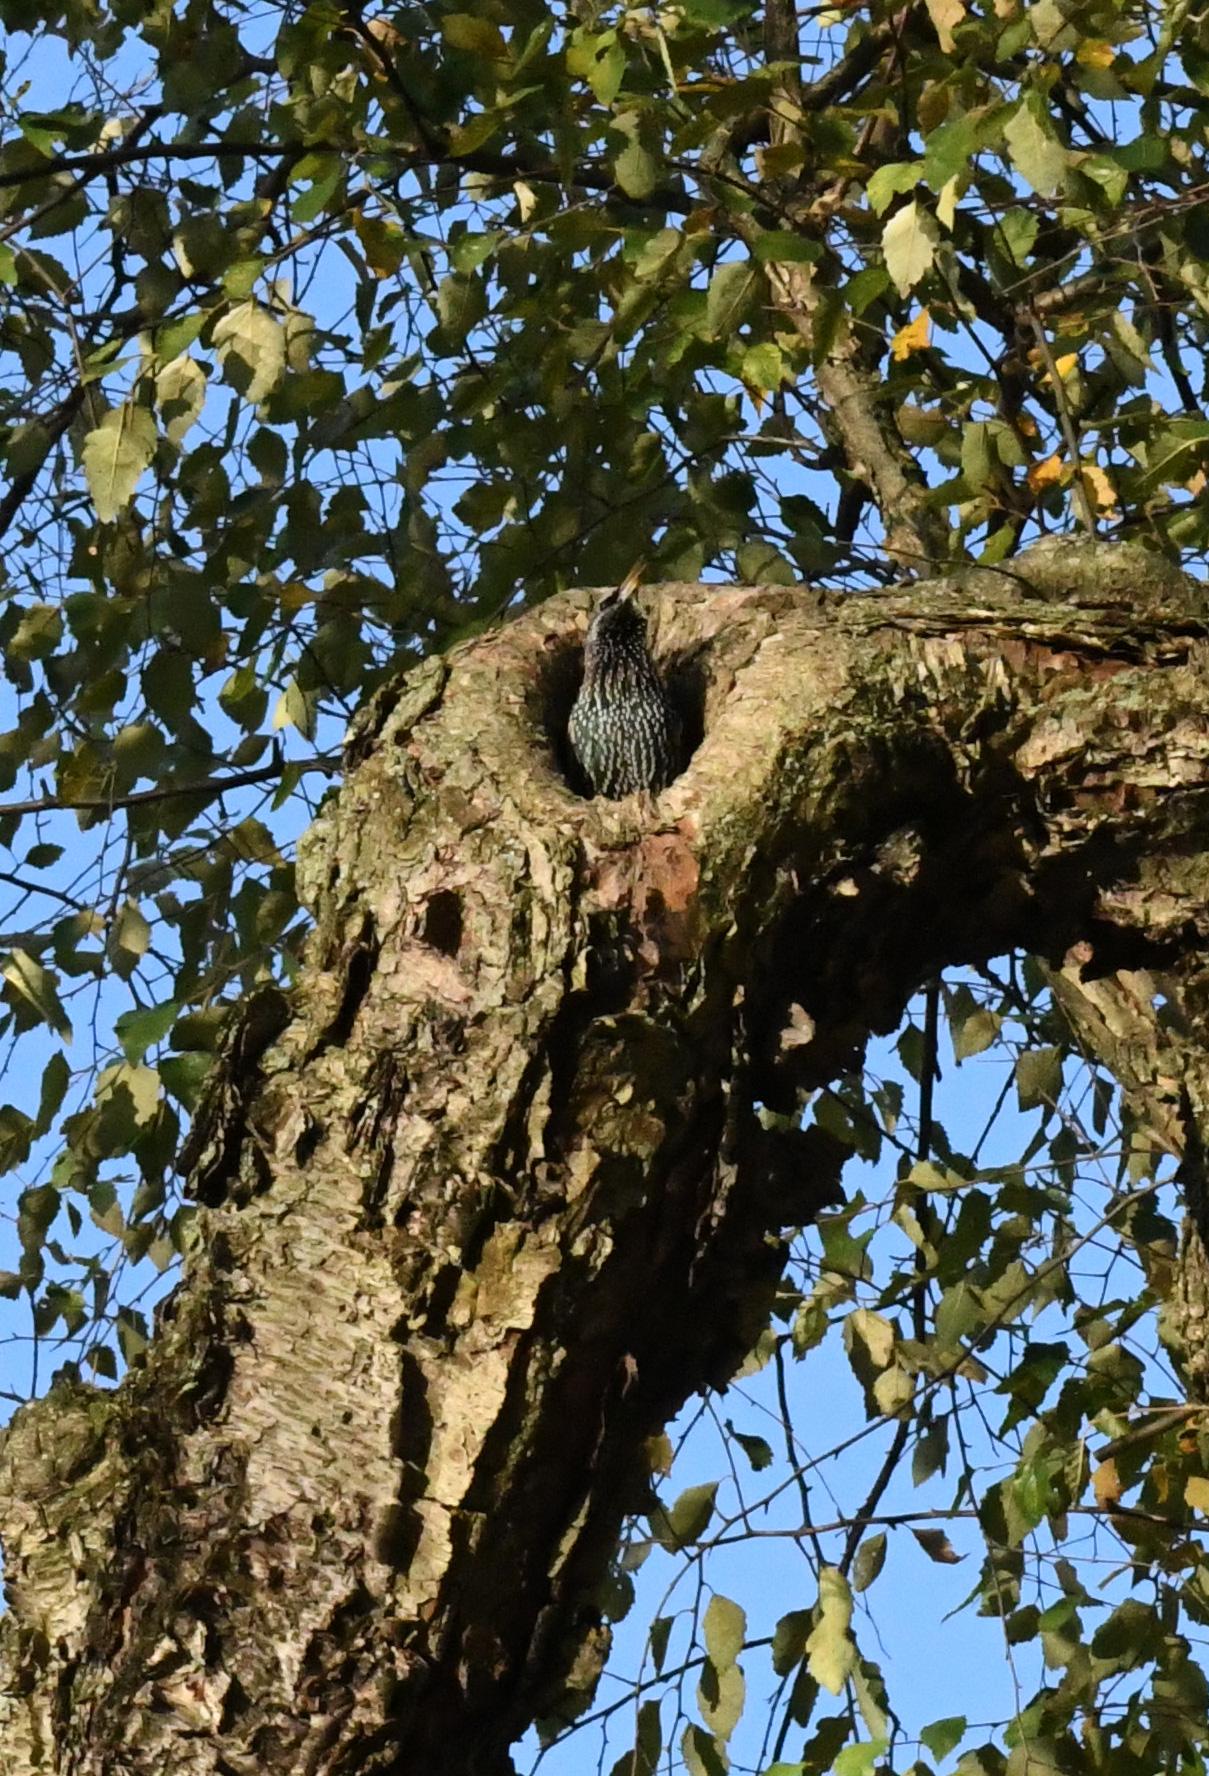 Starling singing, Prospect Park